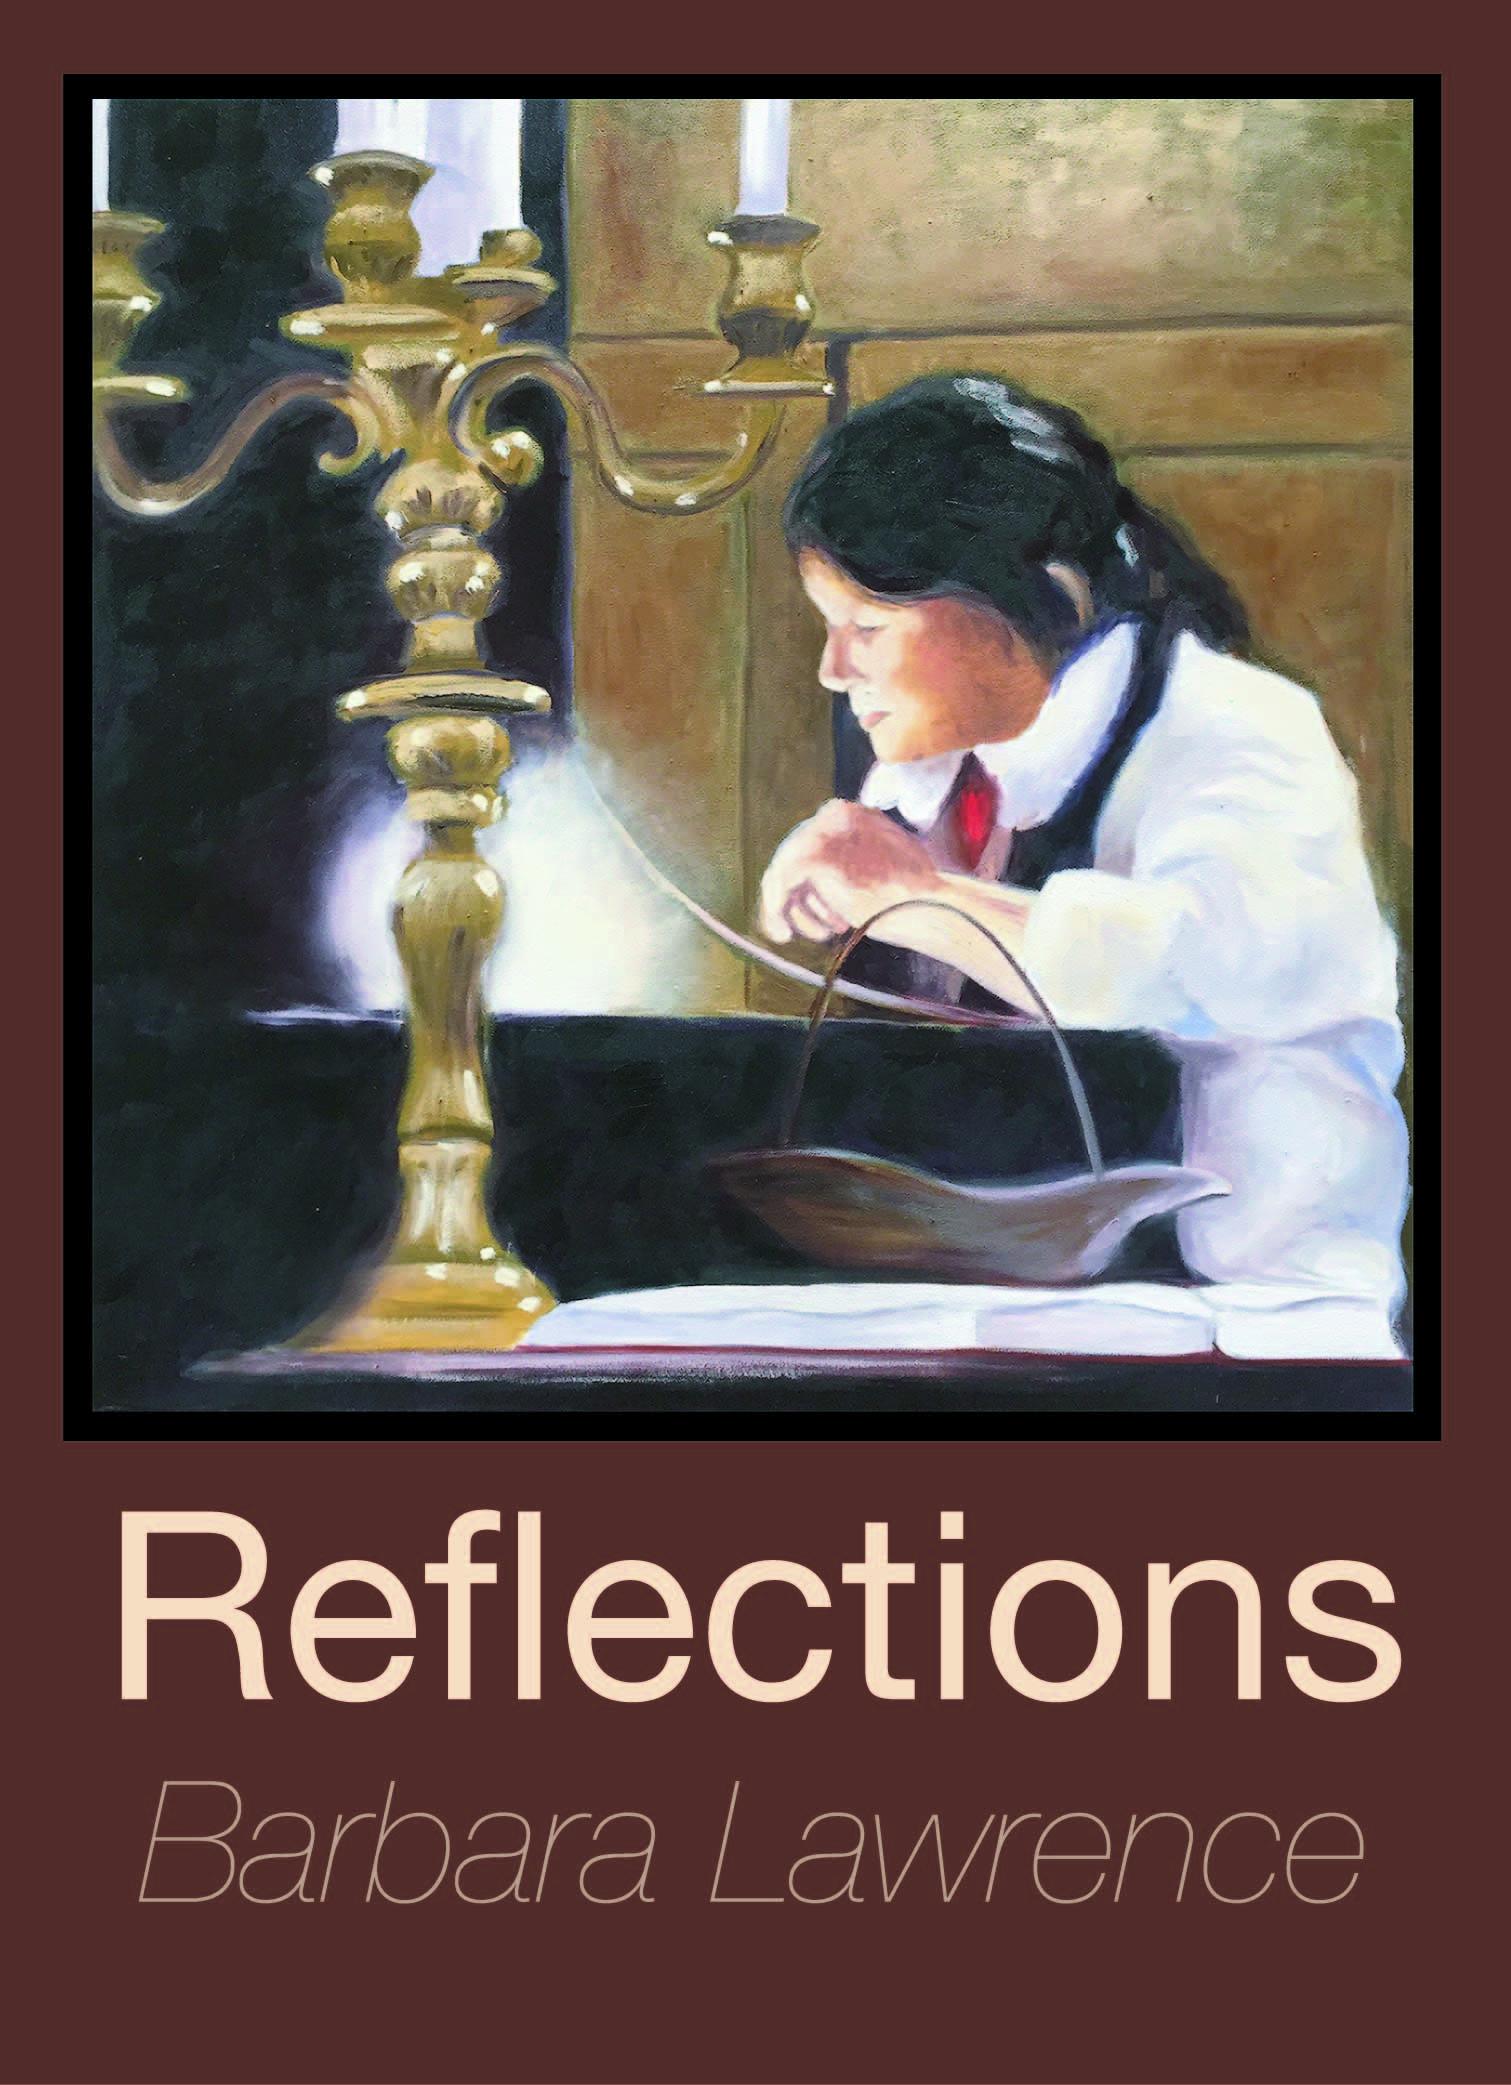 Reflecions card.jpg